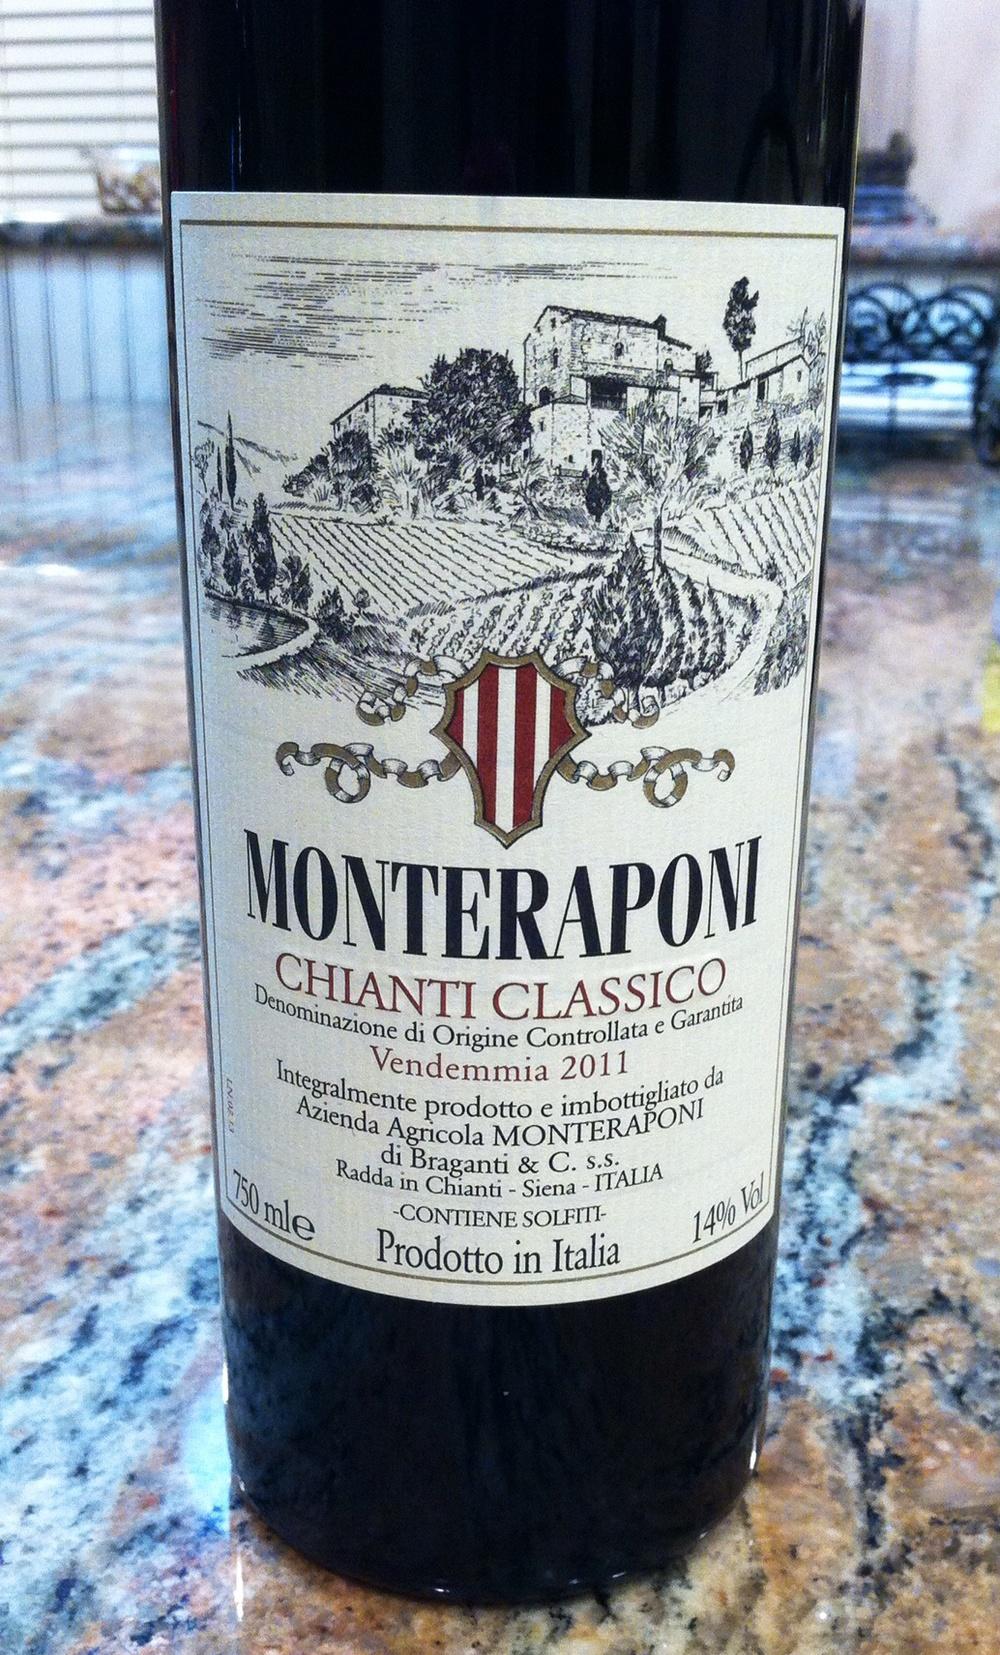 Monteraponi Chianti Classico, Photo by Shana Sokol, Shana Speaks Wine